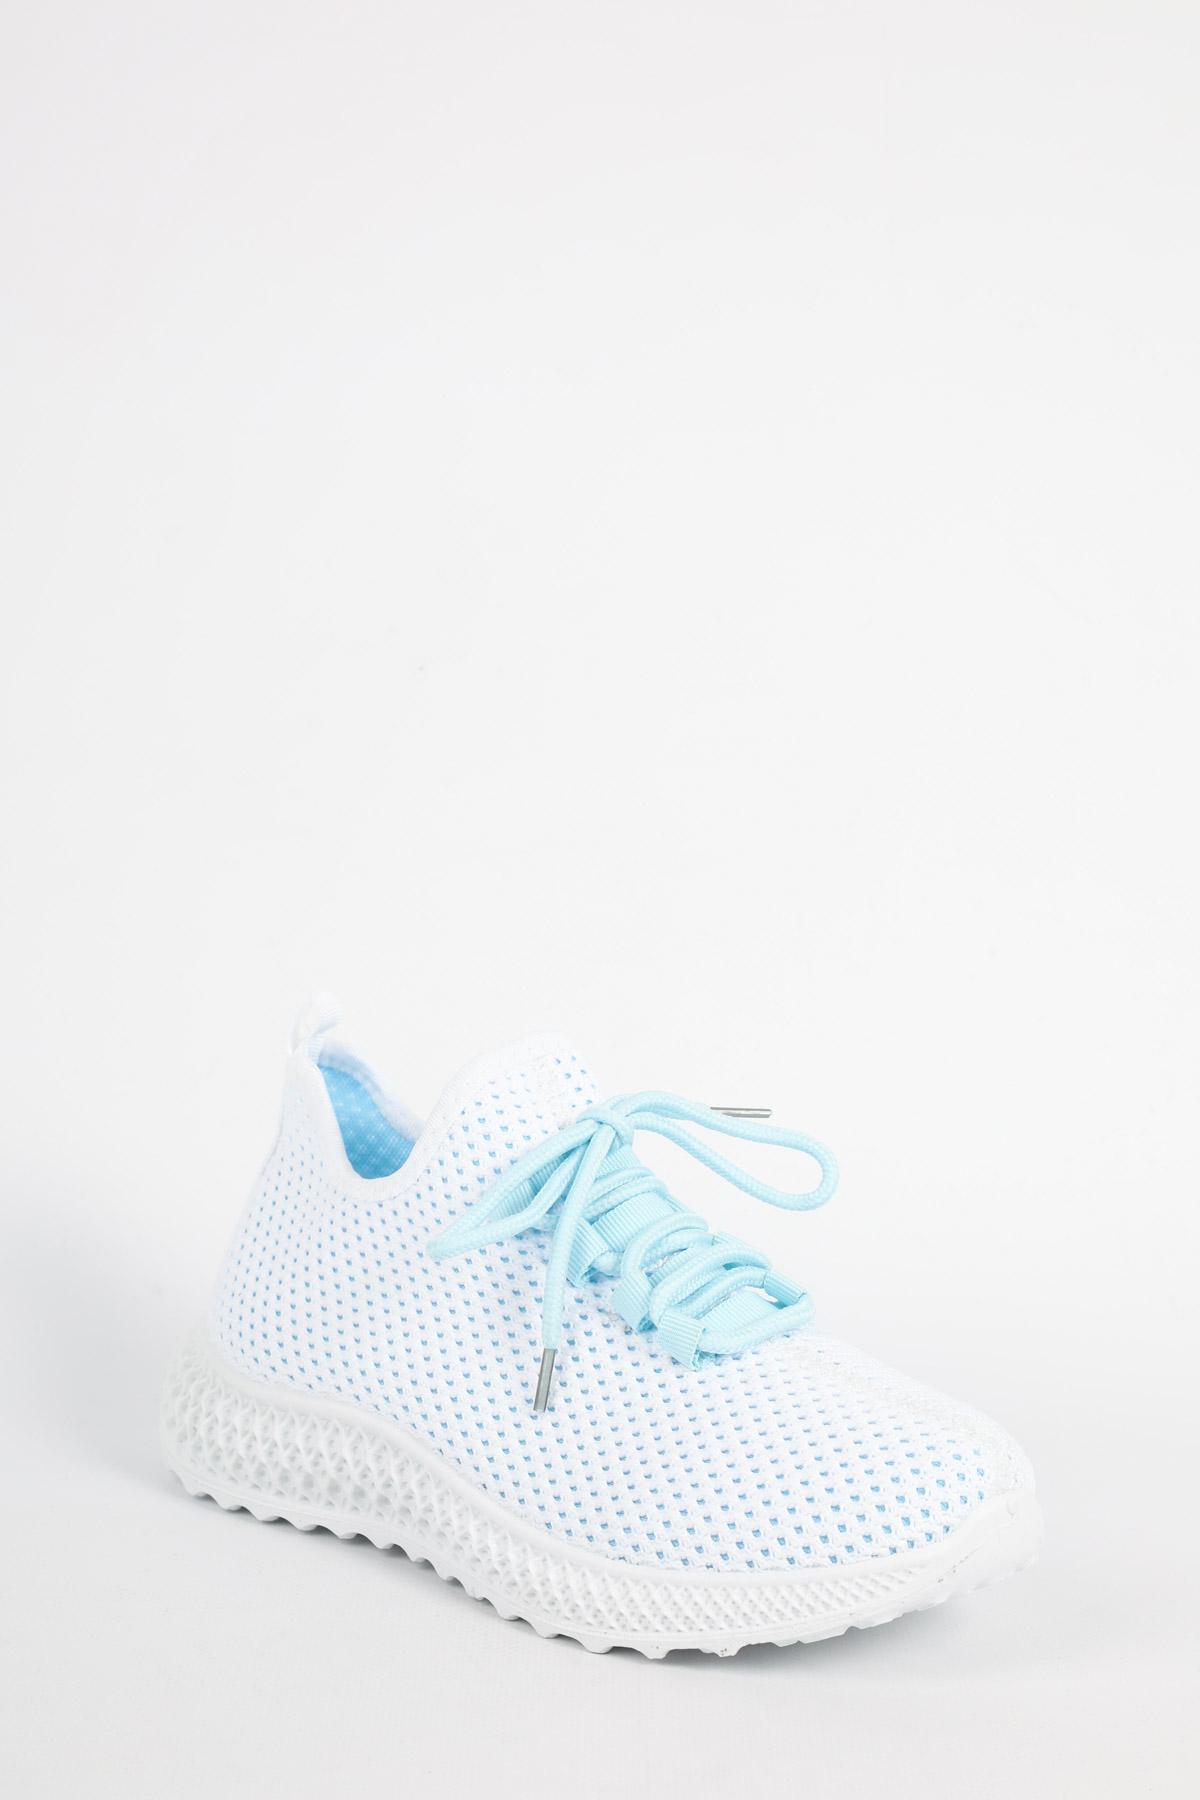 Baskets Chaussures Bleu LOV'IT GG532 #c eFashion Paris